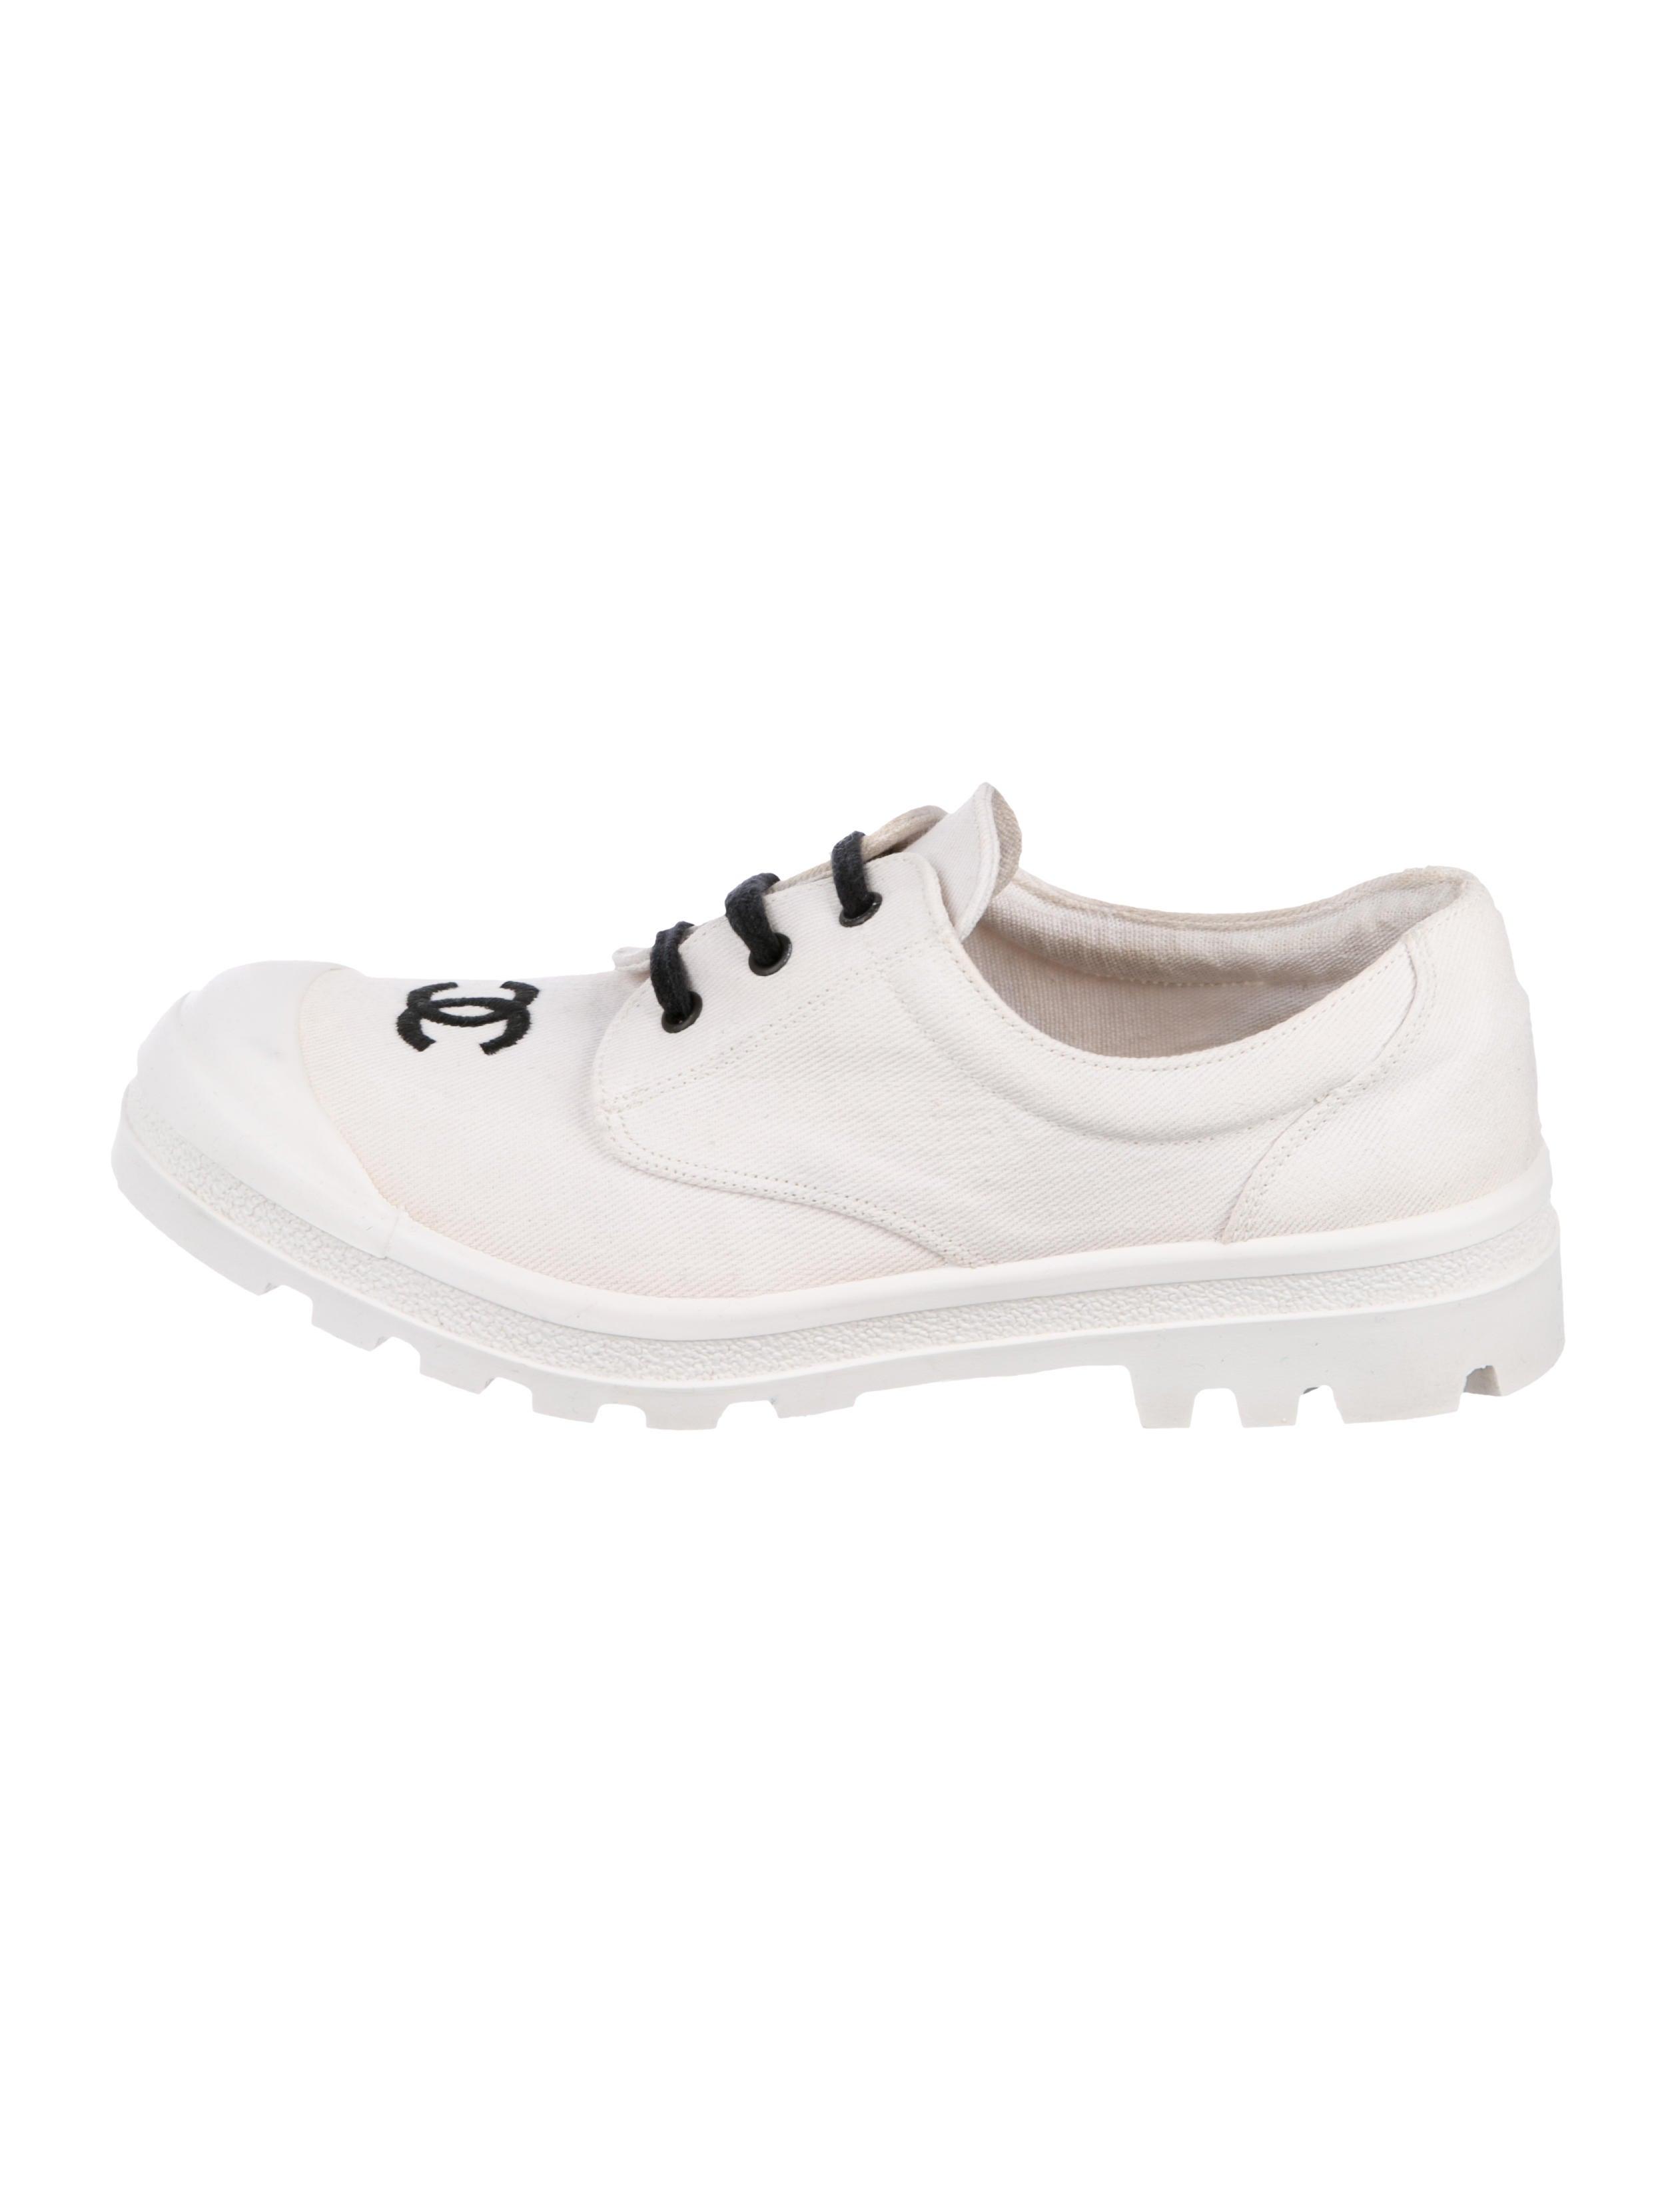 d4e7e145d85 Chanel Sneakers